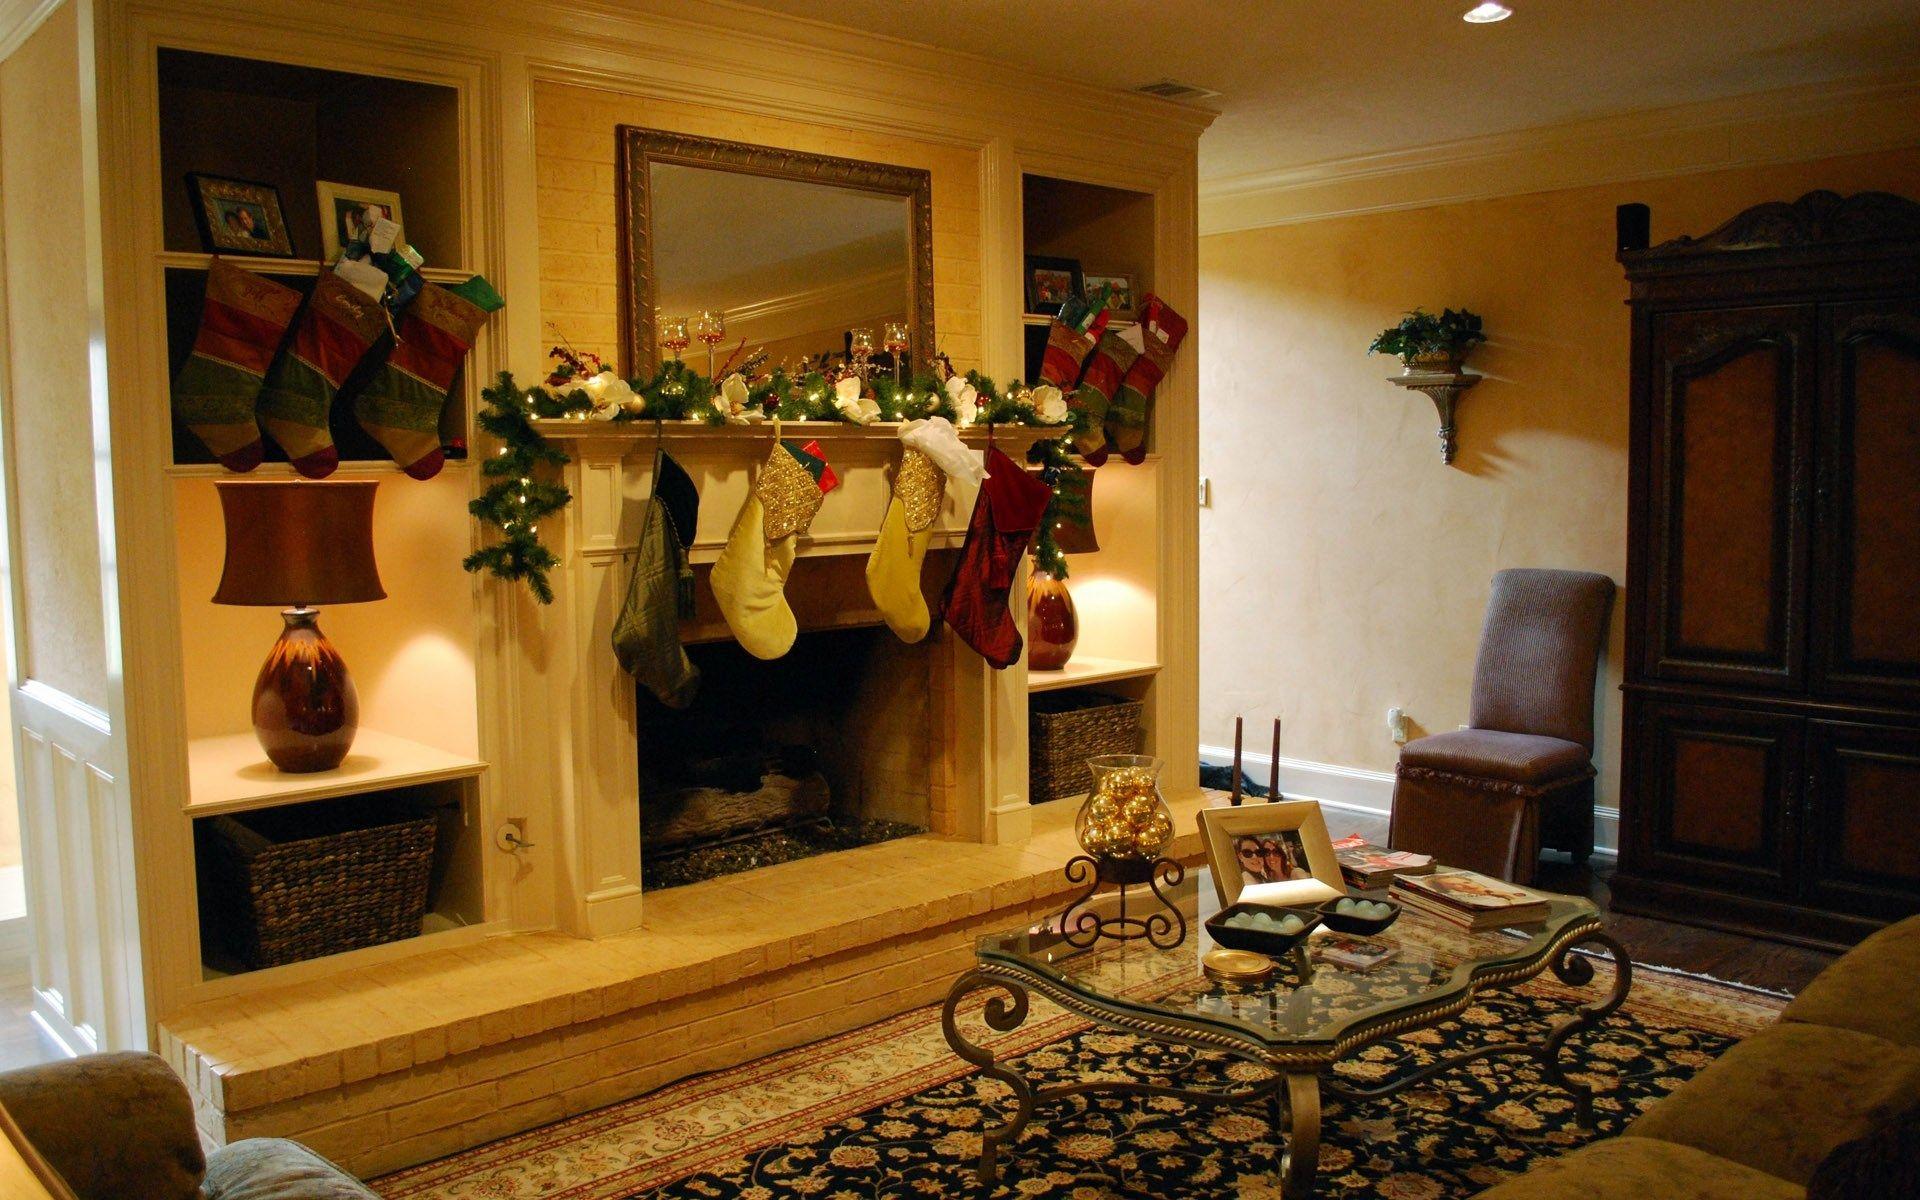 1920x1200 Wallpapers Free Room Christmas Interiorsroom Wallpaperliving